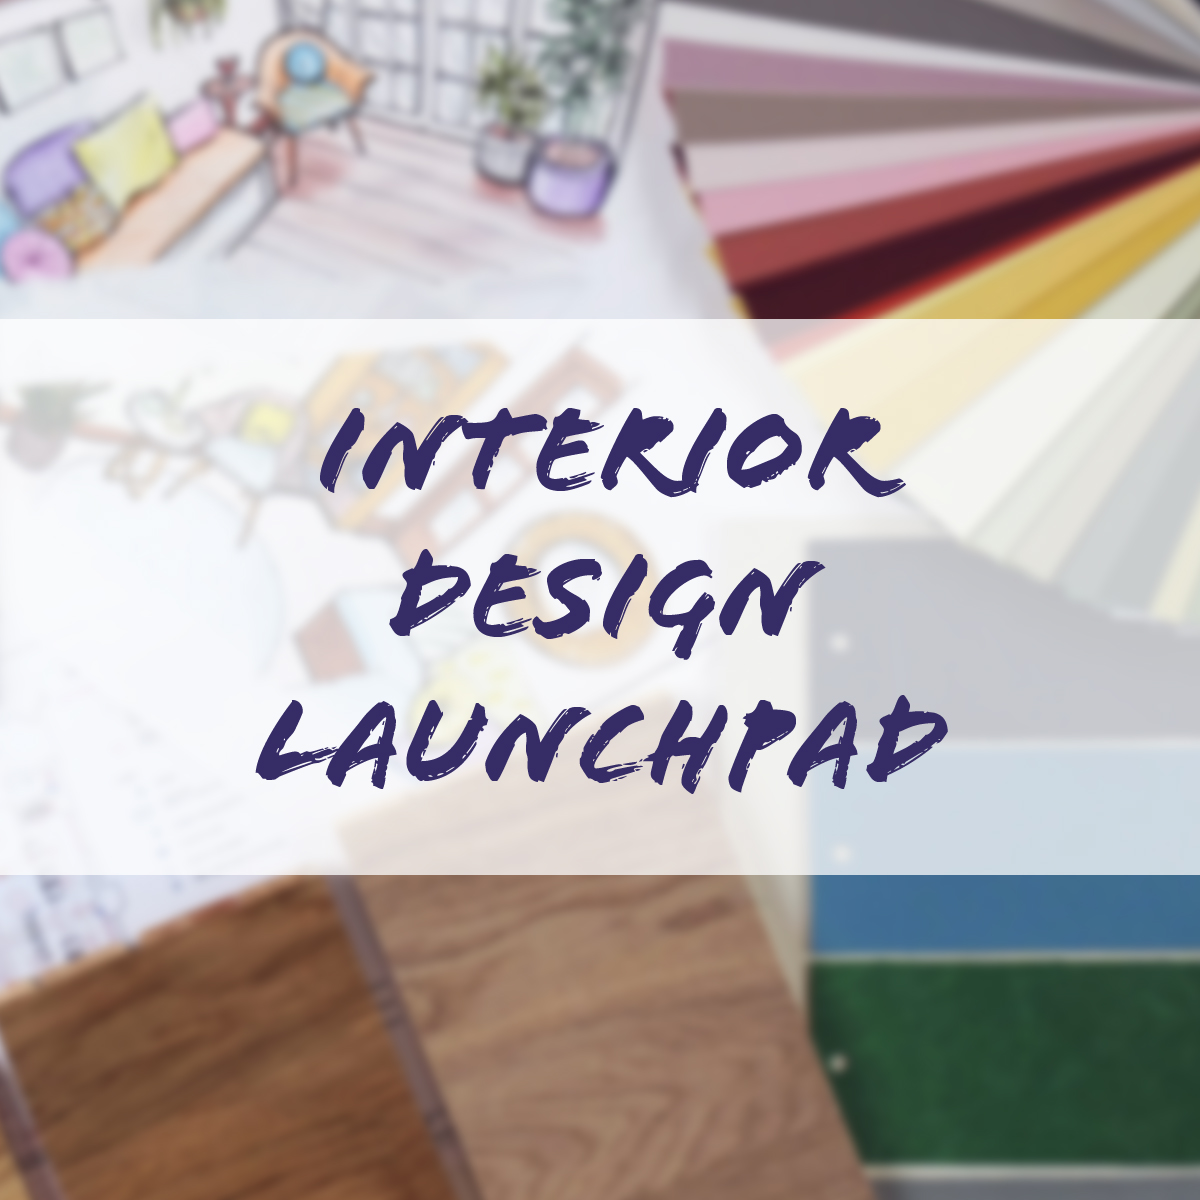 Interior Design Launchpad_onlinecourse.jpg